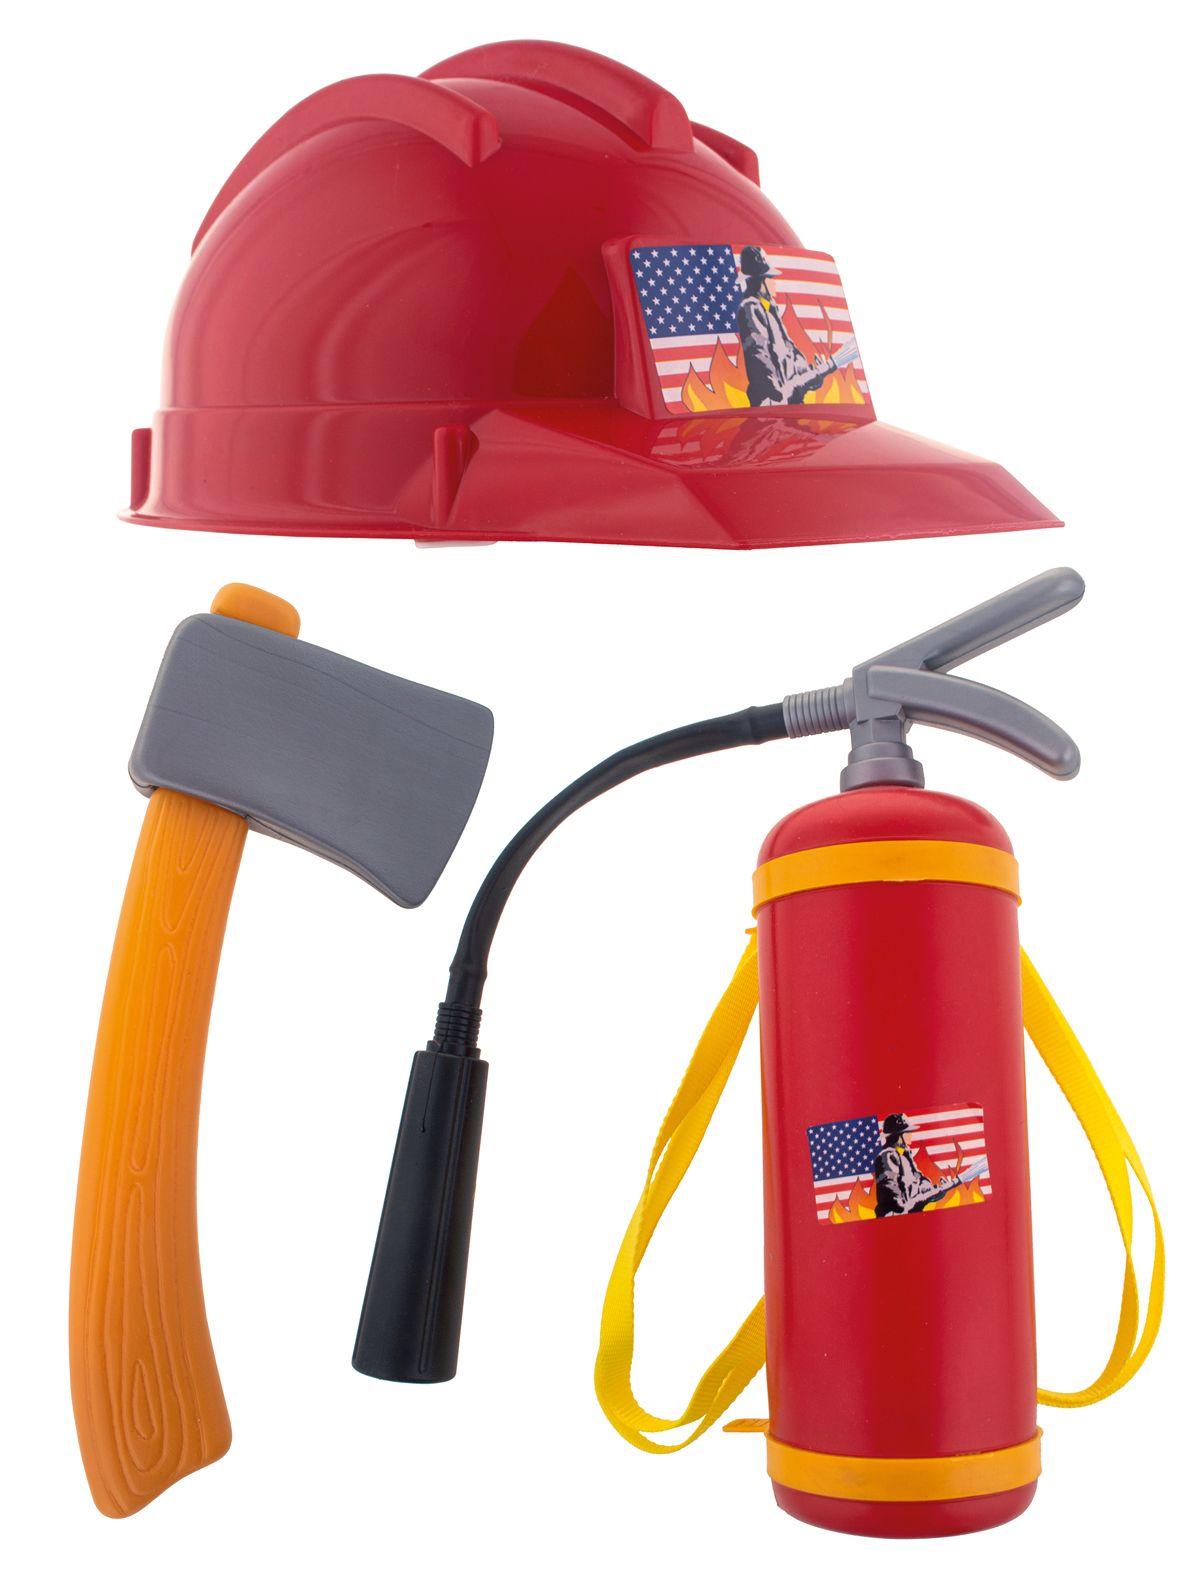 Feuerwehr-Set 3-tlg.